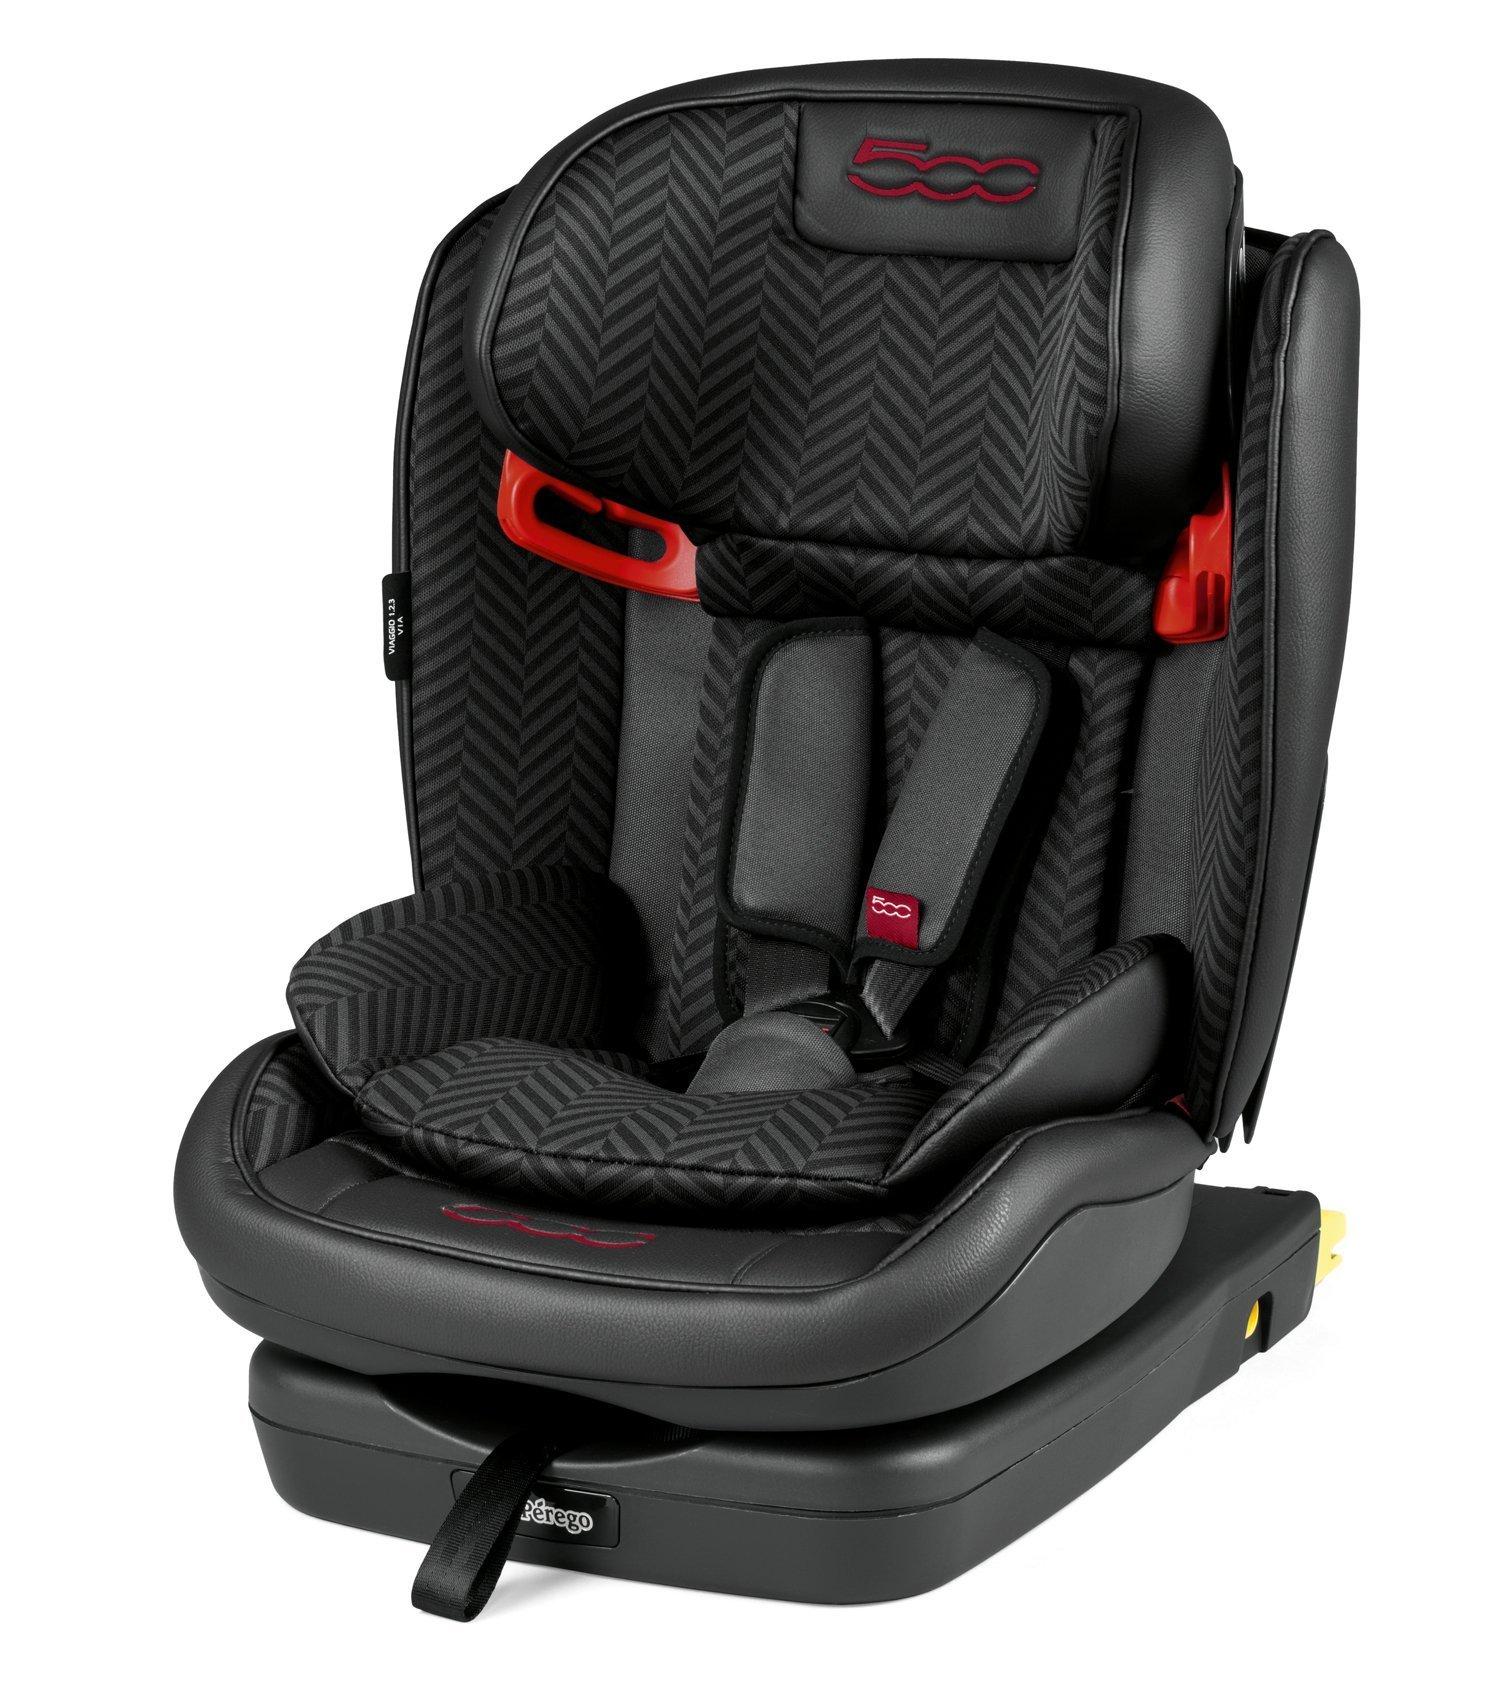 Bērnu autosēdeklis 9-36 kg PEG-PEREGO Viaggio 1-2-3 Via Fiat 500 IMVA000035CV13CY13